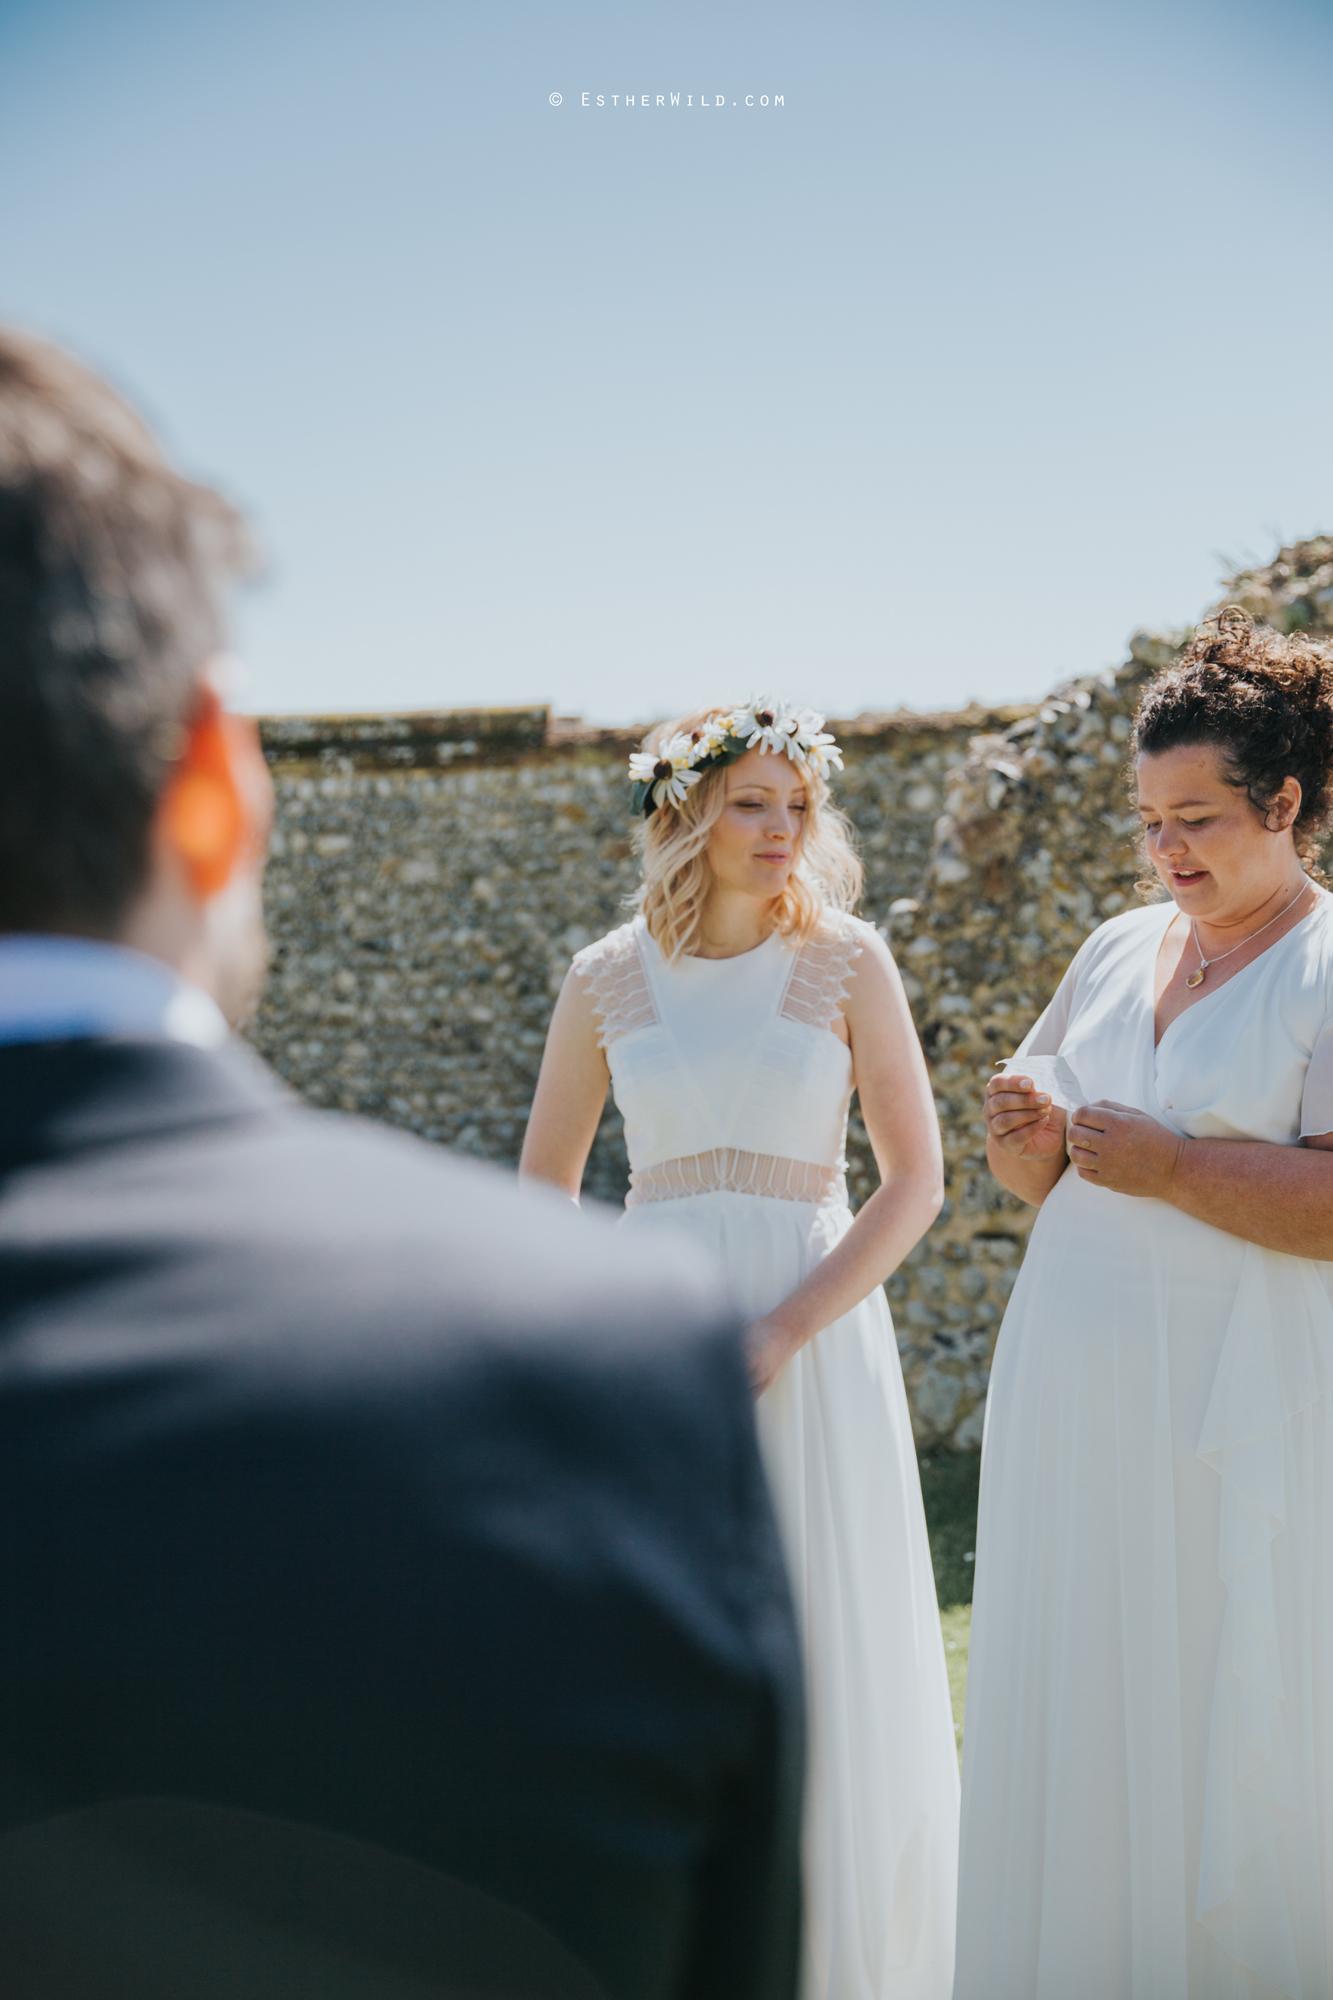 IMG_0535Cley_Barn_Drift_Norfolk_Coast_Wedding_Copyright_Esther_Wild_Photographer_.jpg